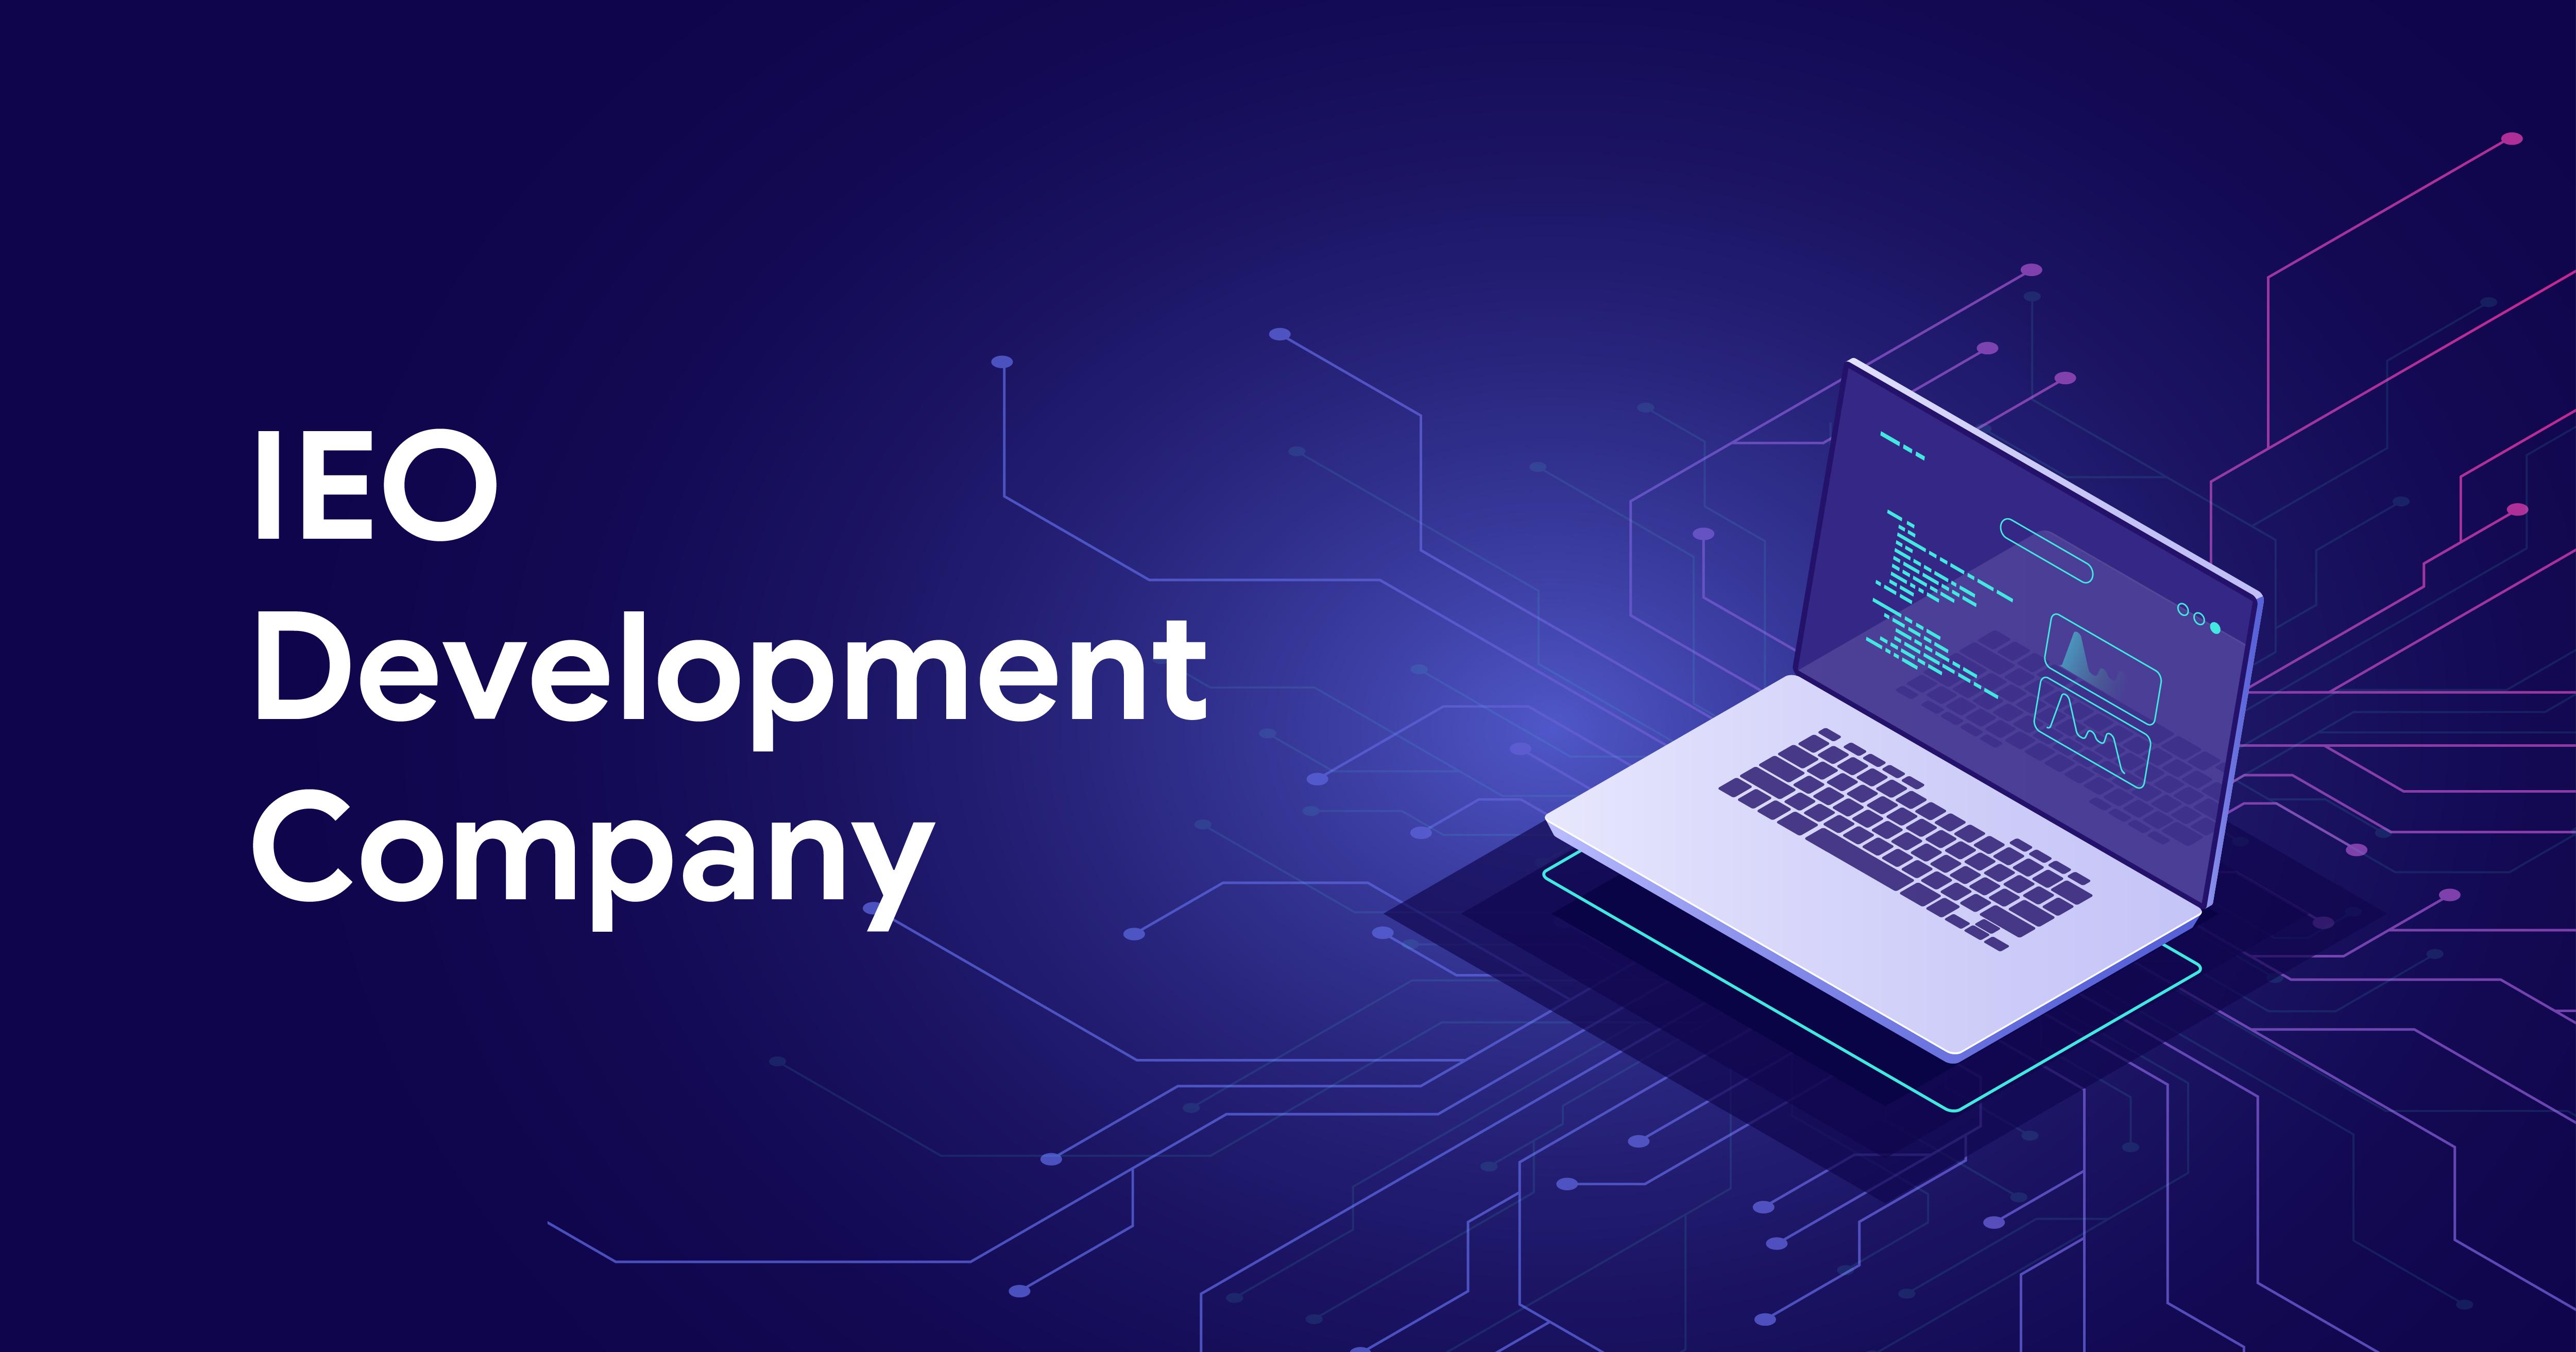 IEO development company